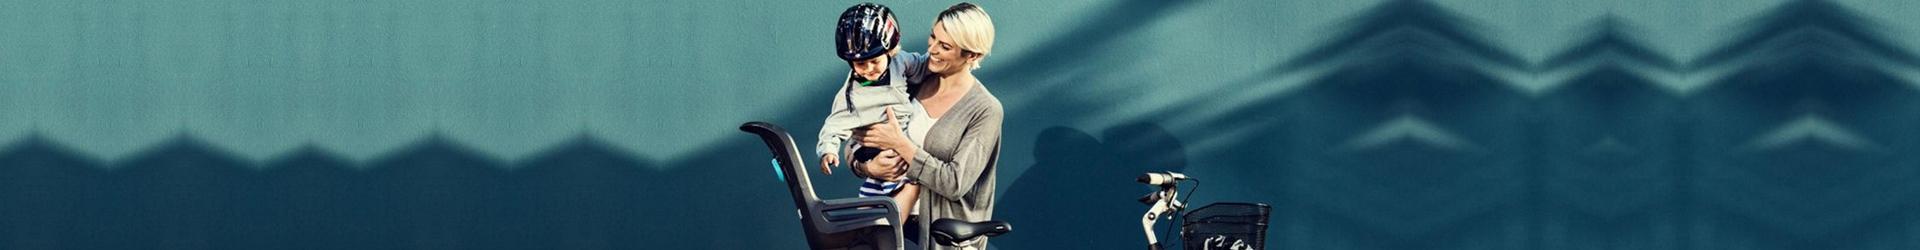 sillas de bicicleta bebe